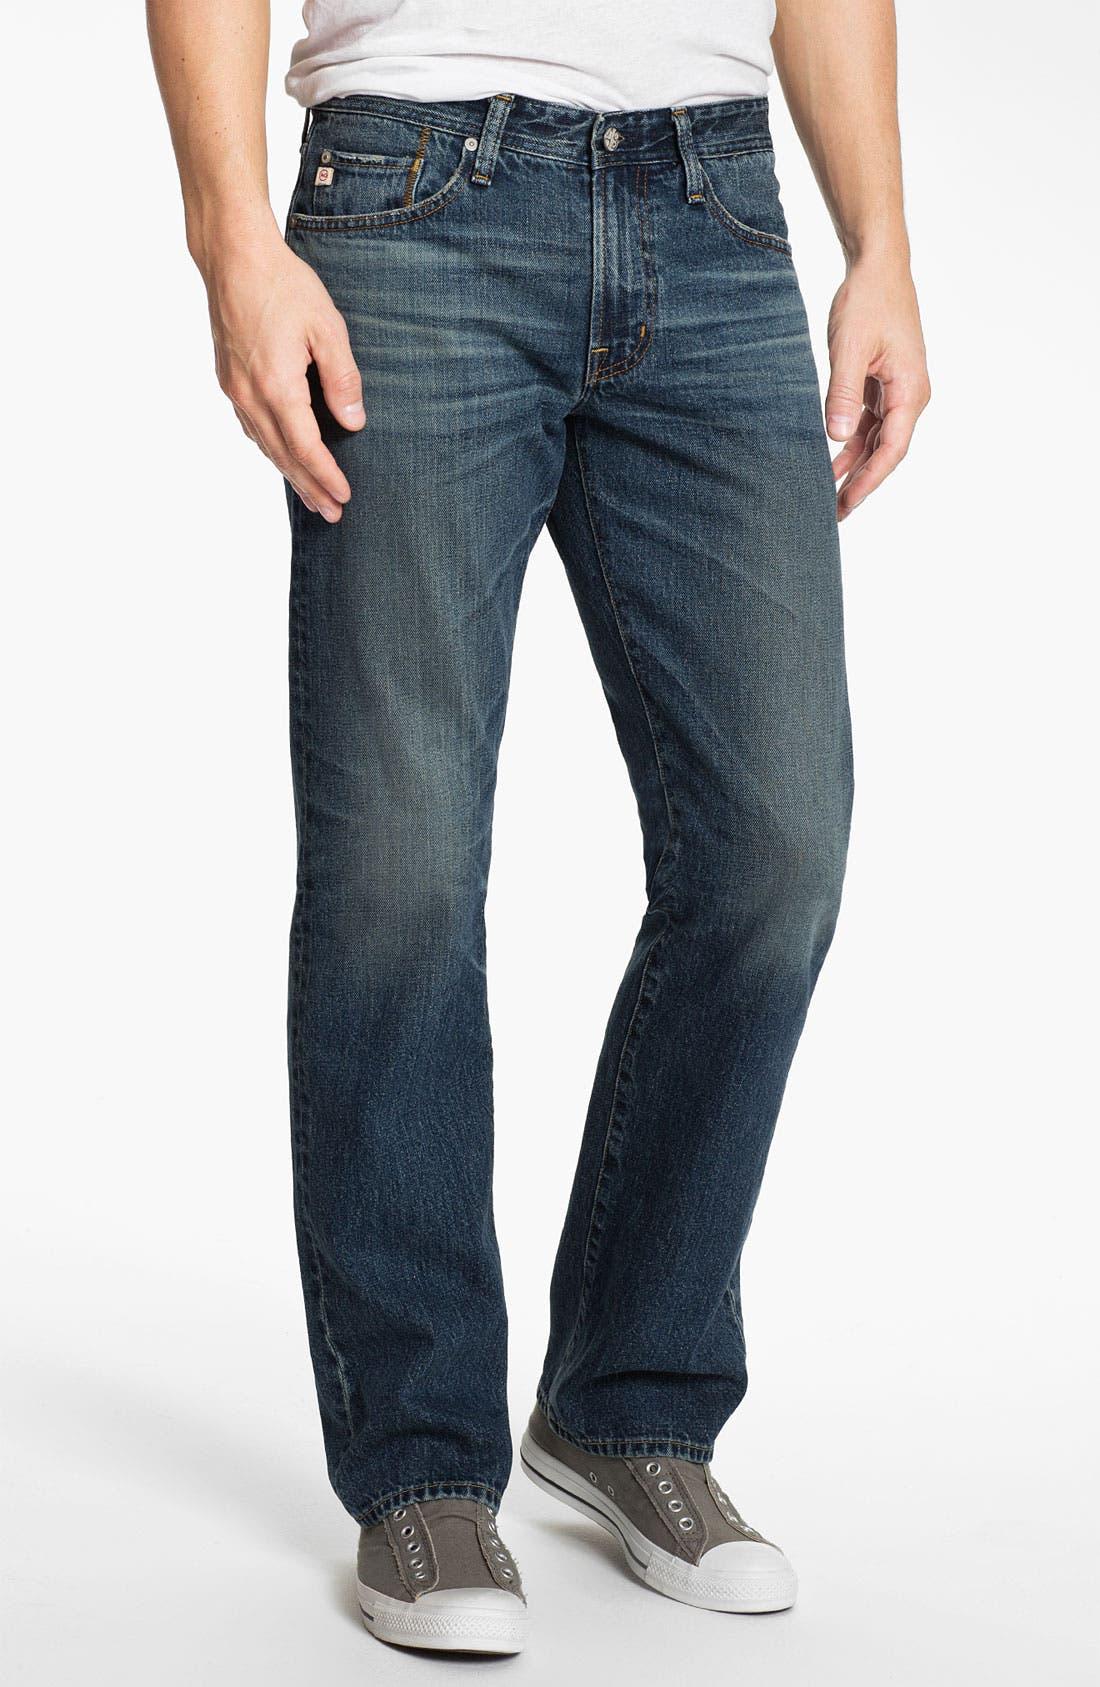 Main Image - AG Jeans 'Protégé' Straight Leg Jeans (12-Years Original)